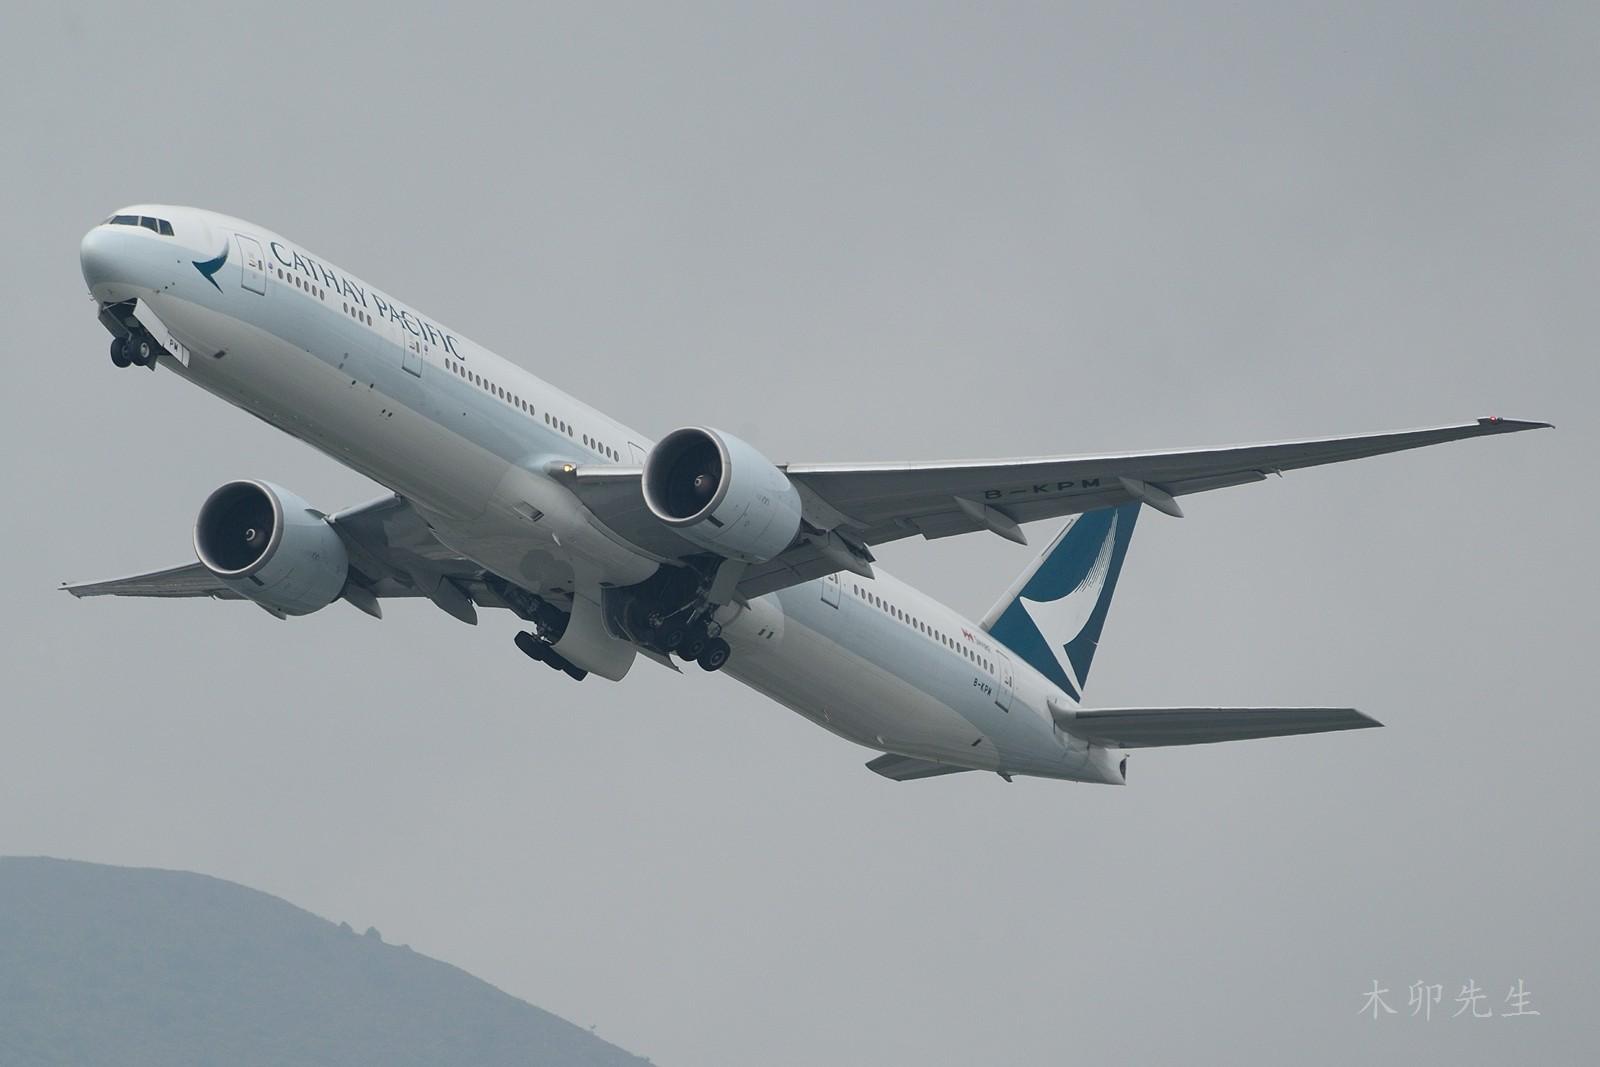 Re:[原创]【木卯先生99】—【2016年香港拍机新发现】—2016 BOEING 777-300ER B-KPM 香港赤鱲角国际机场